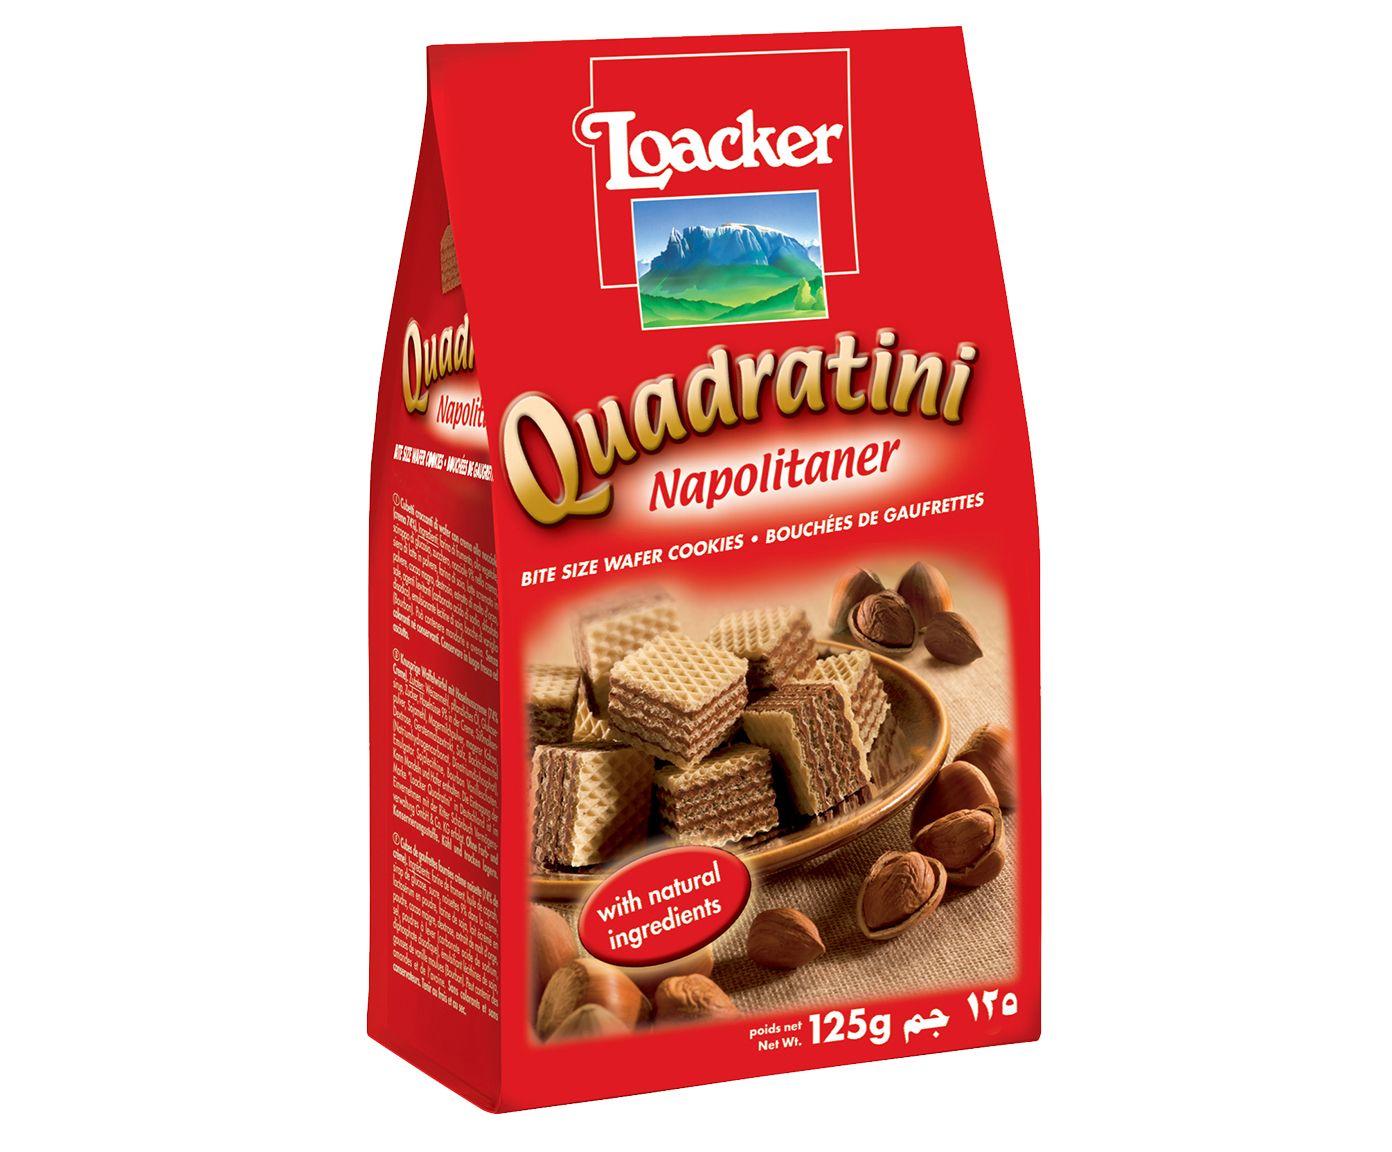 Biscoito Australiano Loacker Quadratini Napolitaner Avelã - 125G | Westwing.com.br